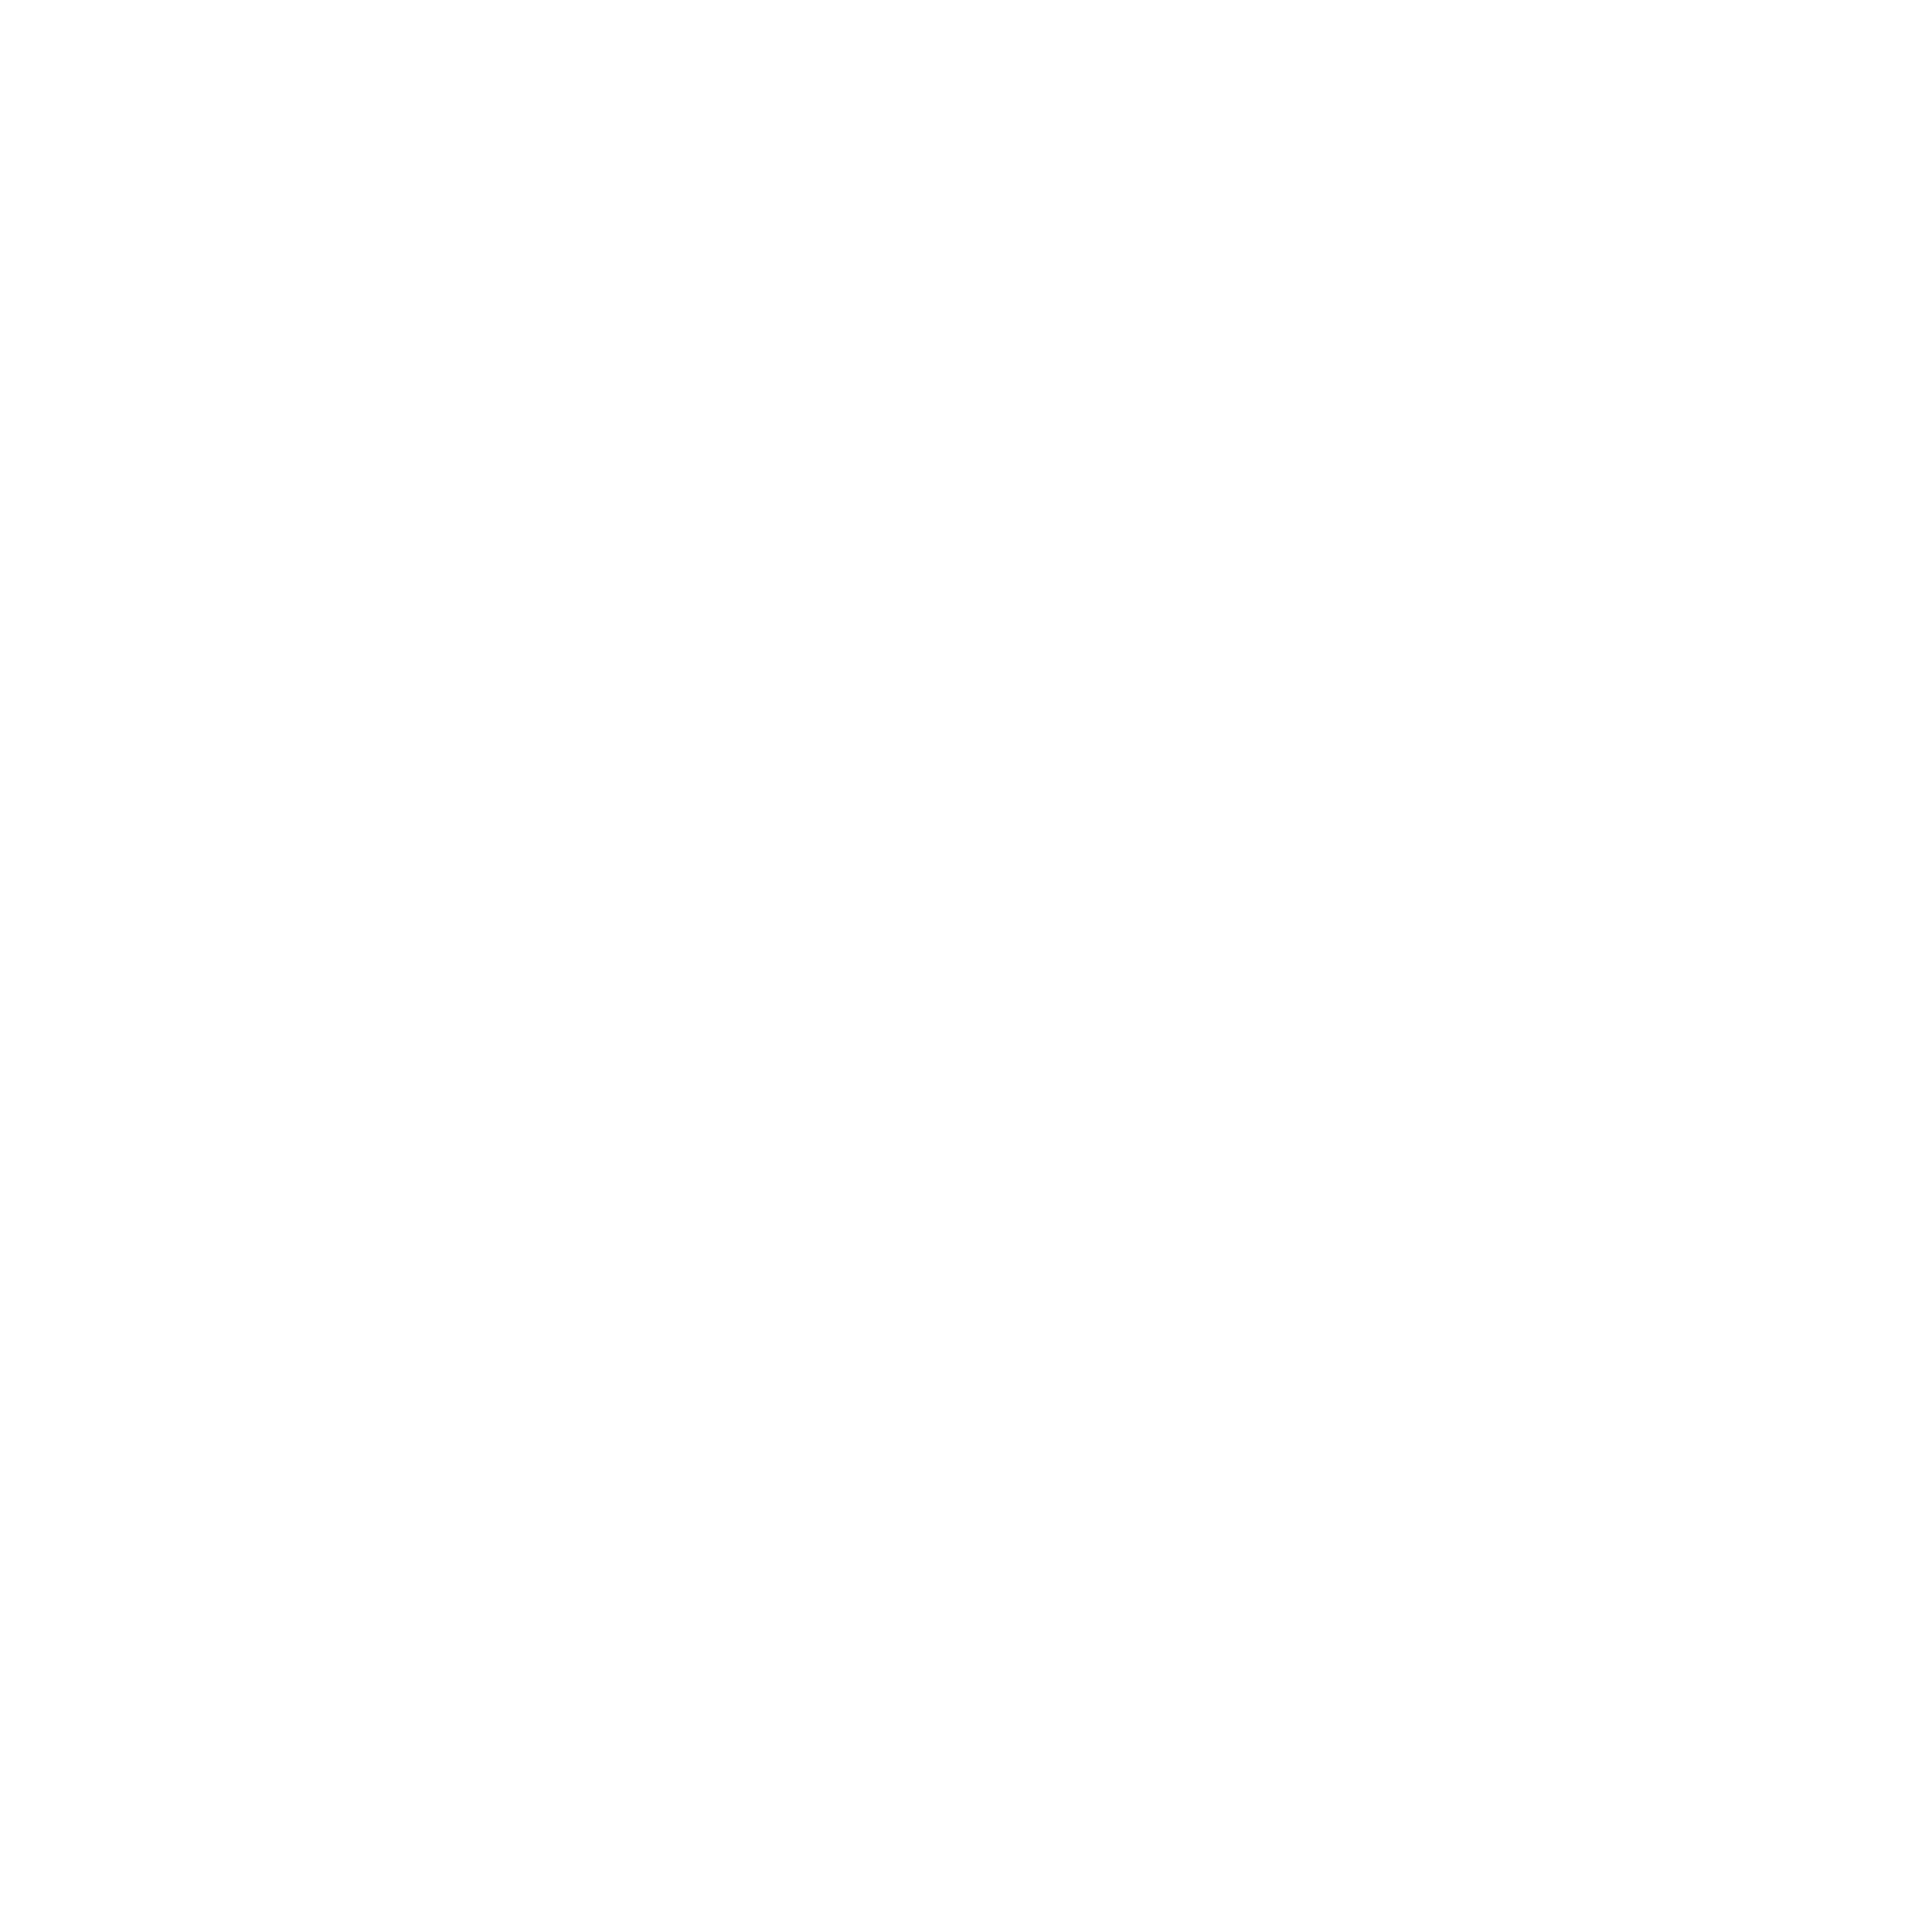 Logo MEG - Mutable Efficient Growing